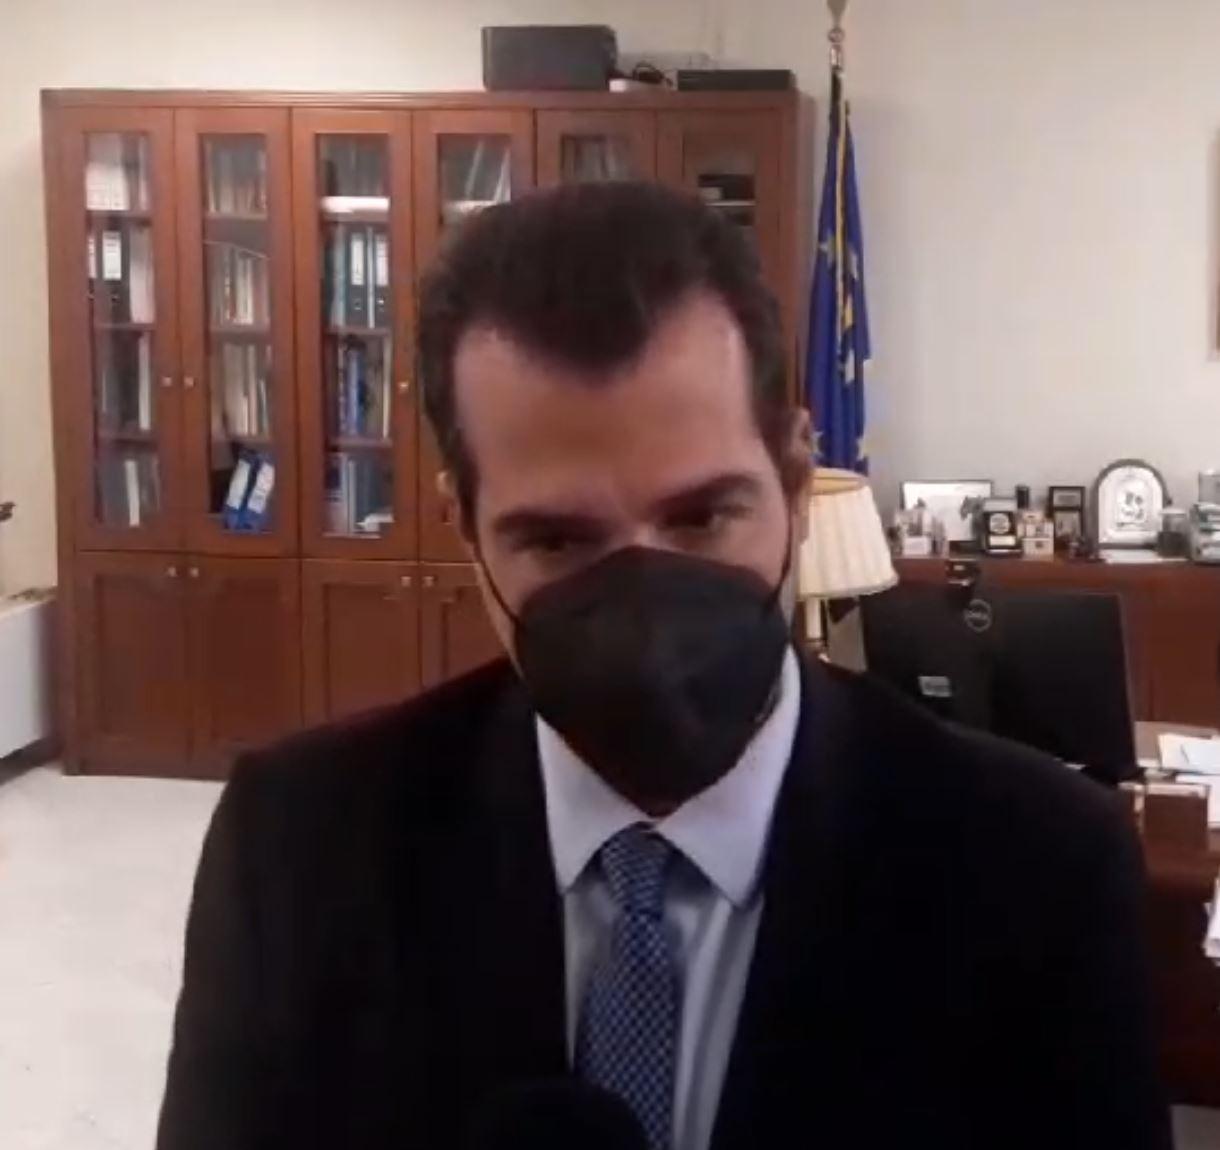 kozan.gr: Κοζάνη: Mε αντιπροσωπεία των υγειονομικών που τέθηκαν σε αναστολή εργασίας, επειδή δεν εμβολιάστηκαν, μίλησε ο Υπουργός Υγείας Θ. Πλεύρης – Τι δήλωσε, ακριβώς, μετά τη συνάντηση μαζί τους (Βίντεο)